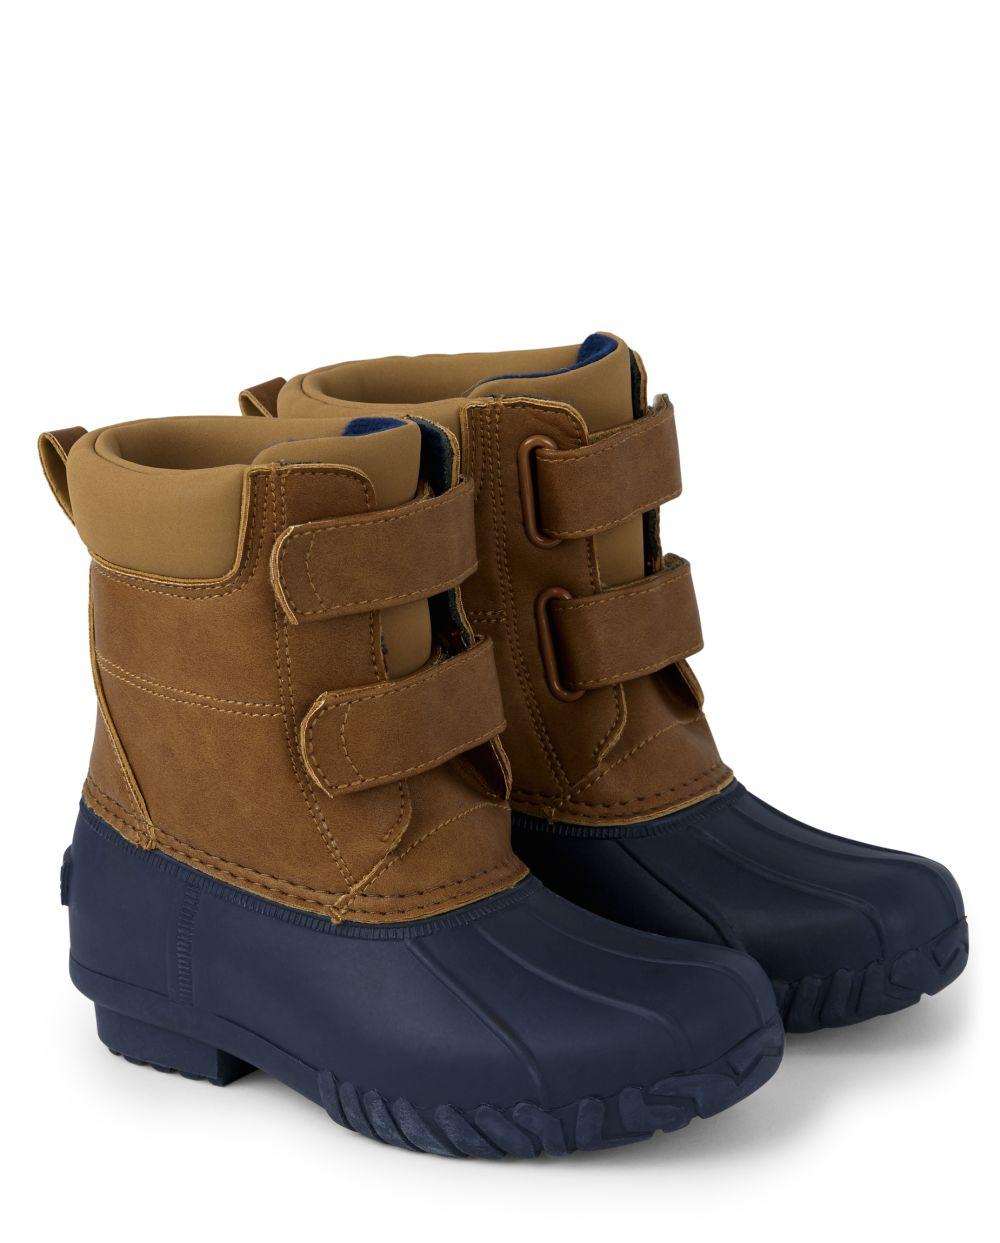 Boys Snow Boots - Aspen Lodge